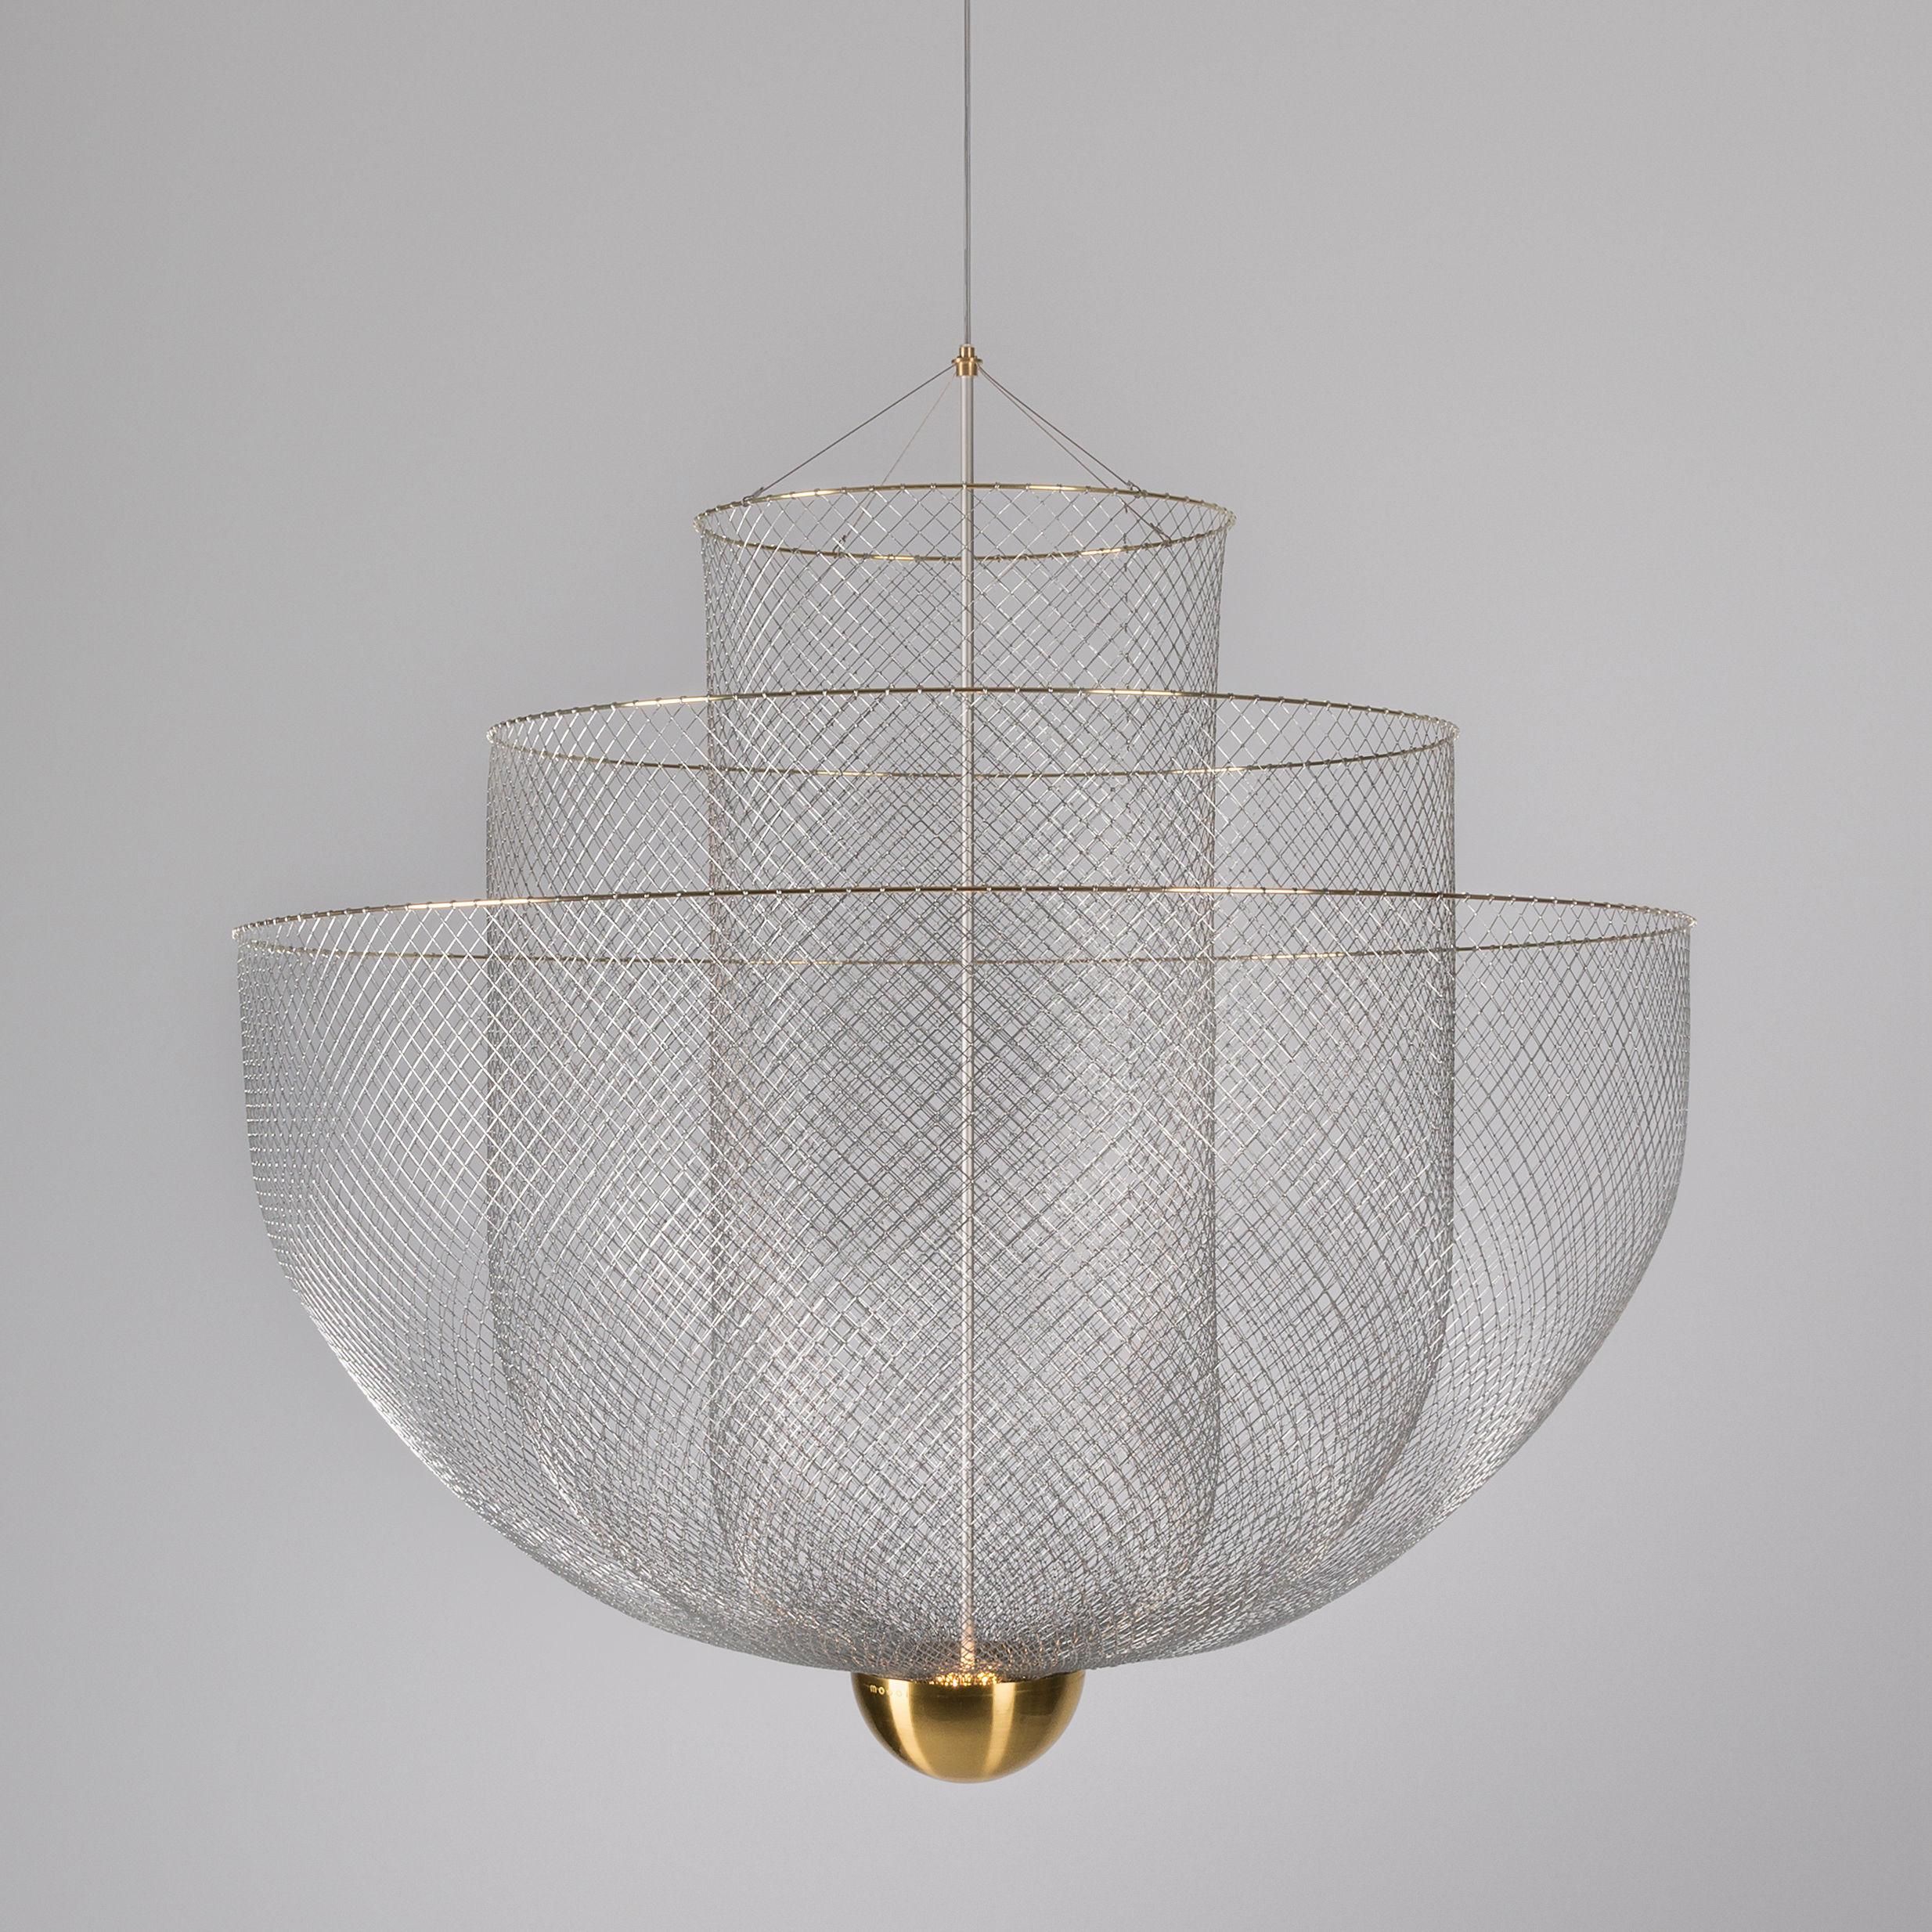 Illuminazione - Lampadari - Sospensione Meshmatics Large LED - / Ø 90 cm - Griglia d'acciaio di Moooi - Acciaio & ottone - Grillage d'acier galvanisé, Ottone